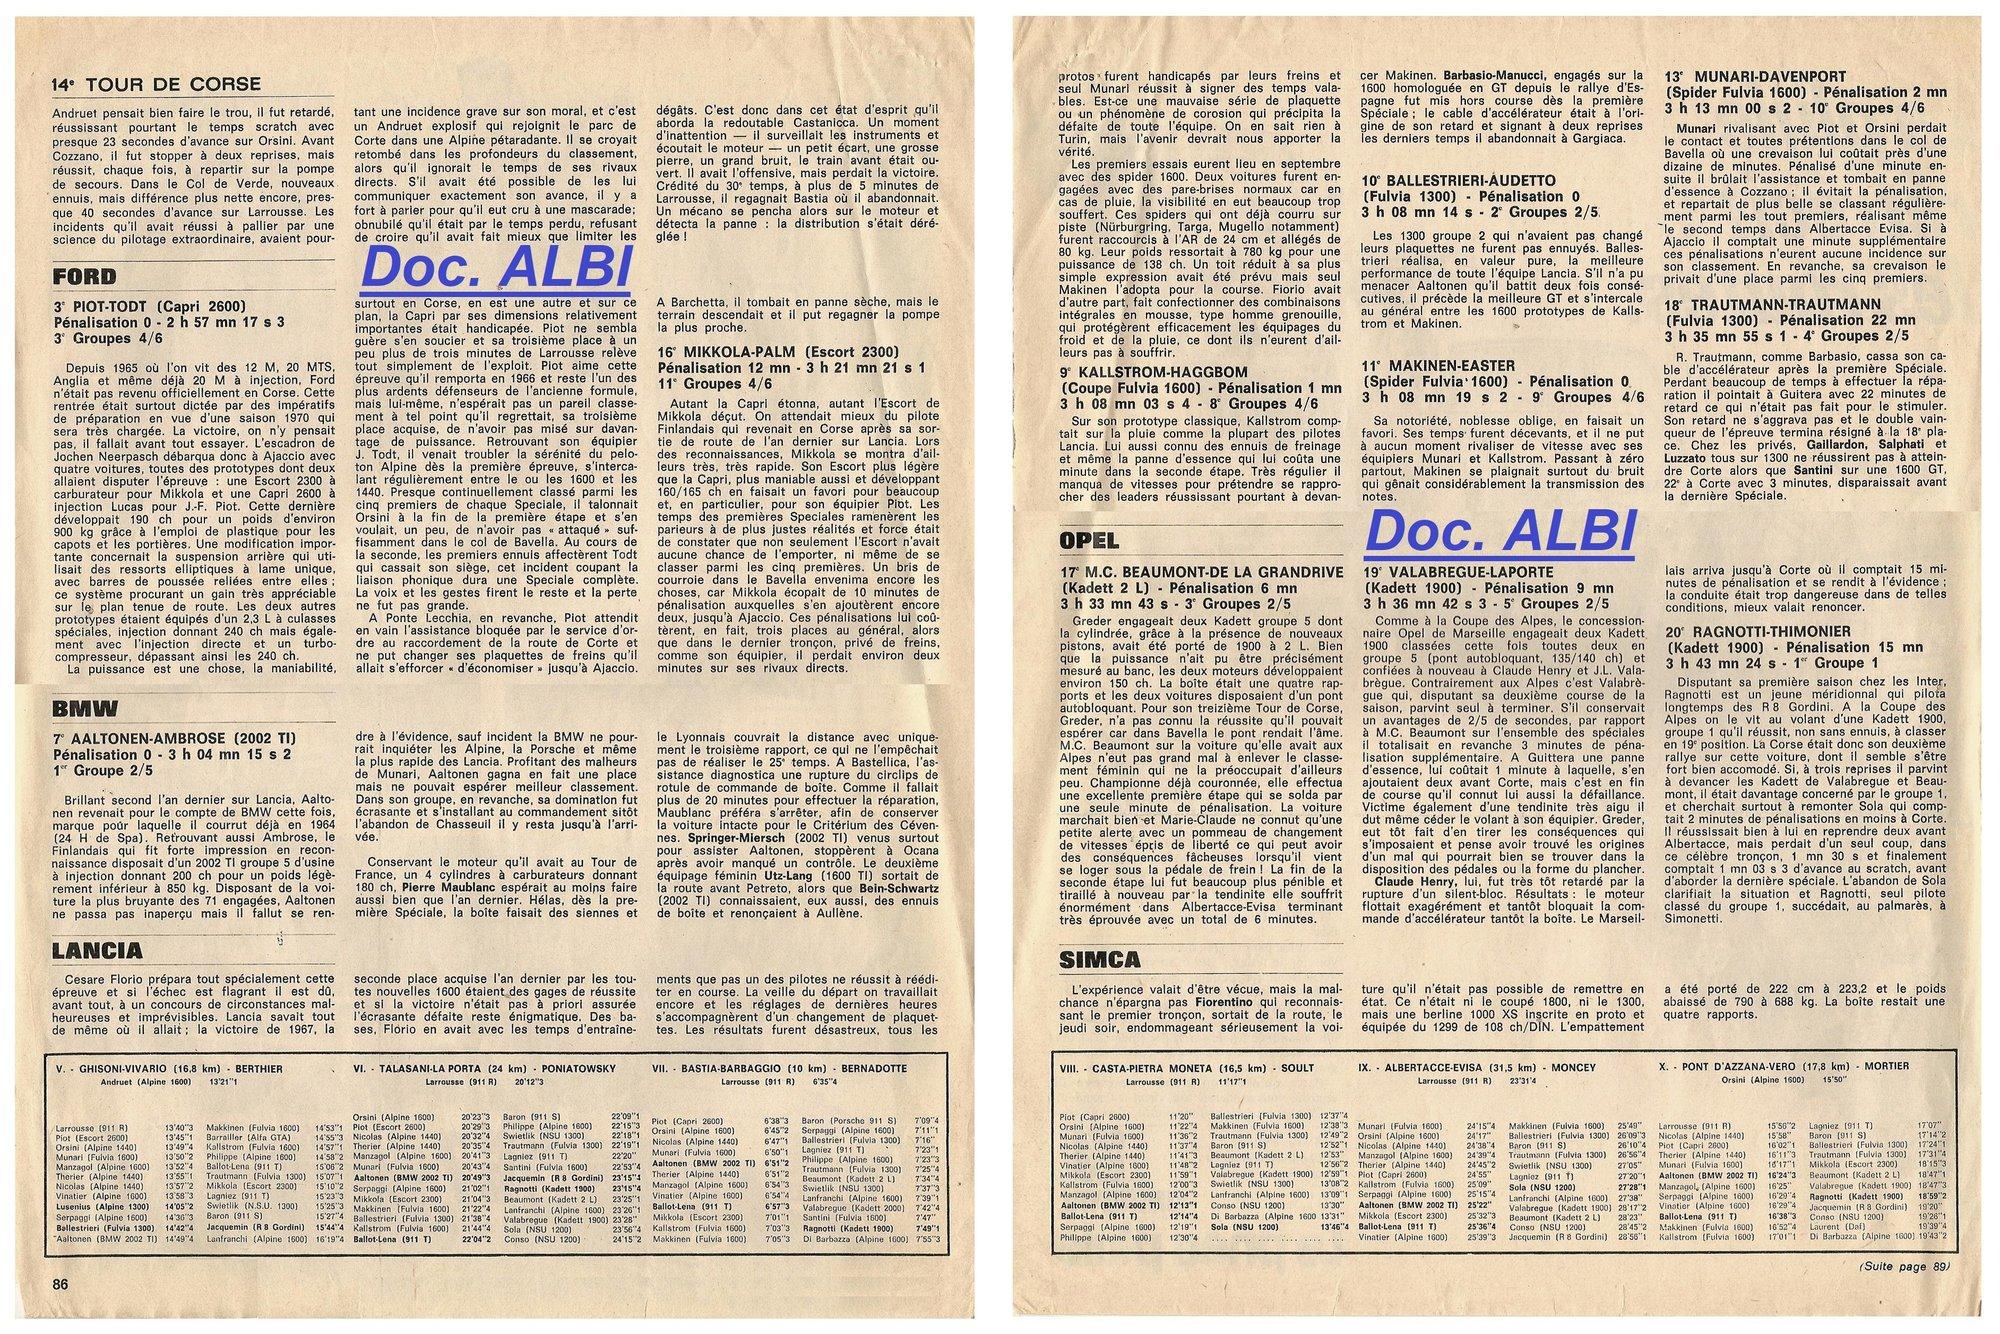 1969-Eu10-Tour-Corse-A-06-07-a.thumb.jpg.00b9d75a4dddb7c7621242f12608d807.jpg